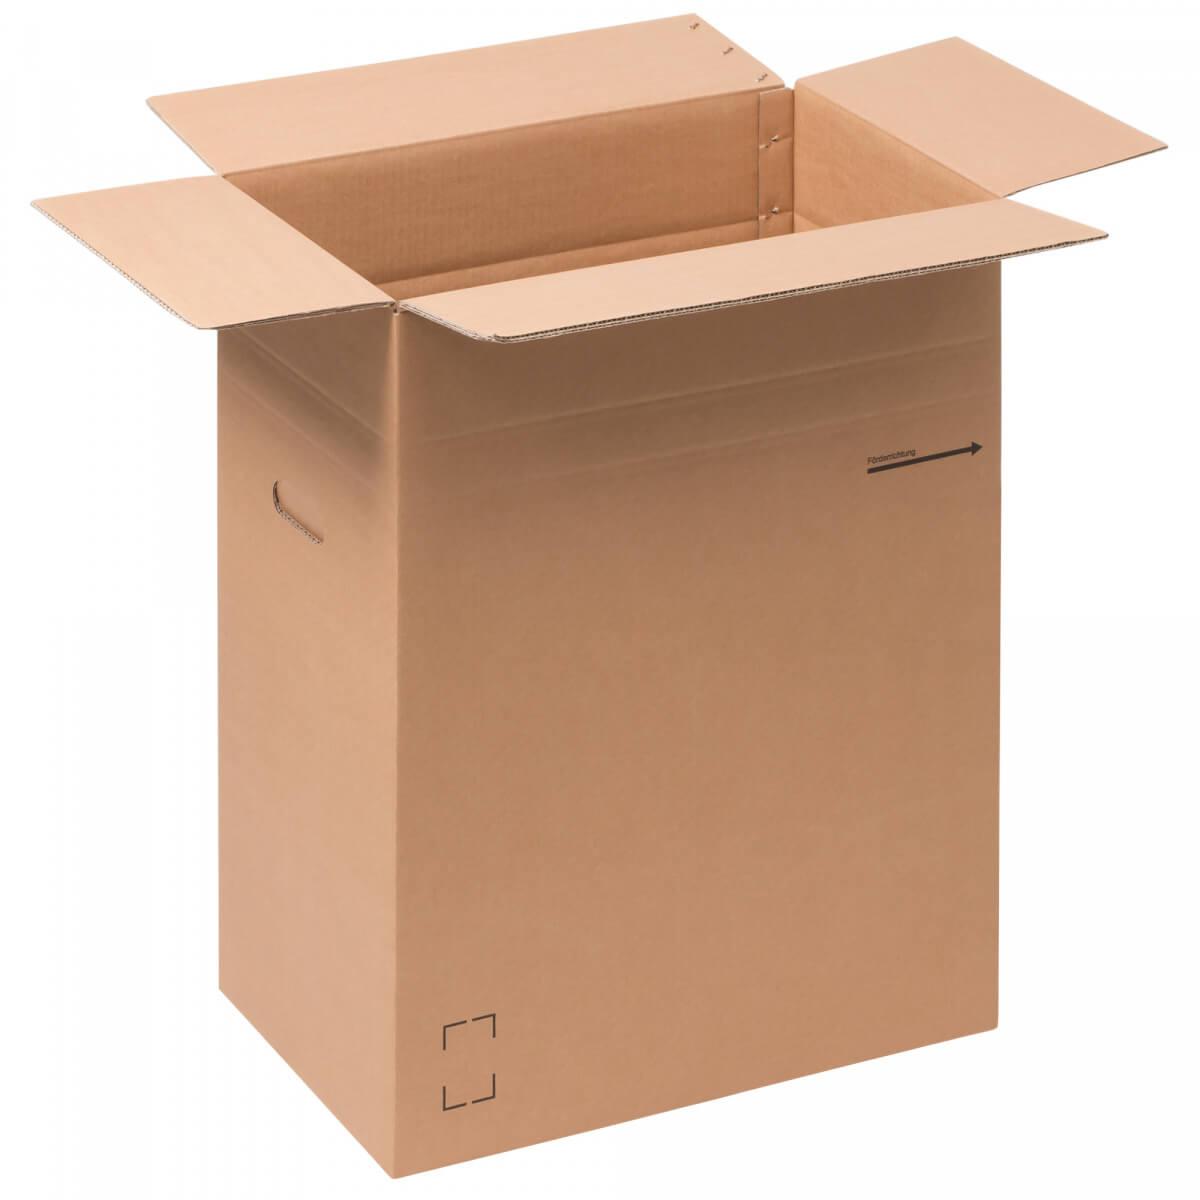 545x340x700 mm zweiwelliger faltkarton pack haus verpackung direkt vom hersteller. Black Bedroom Furniture Sets. Home Design Ideas